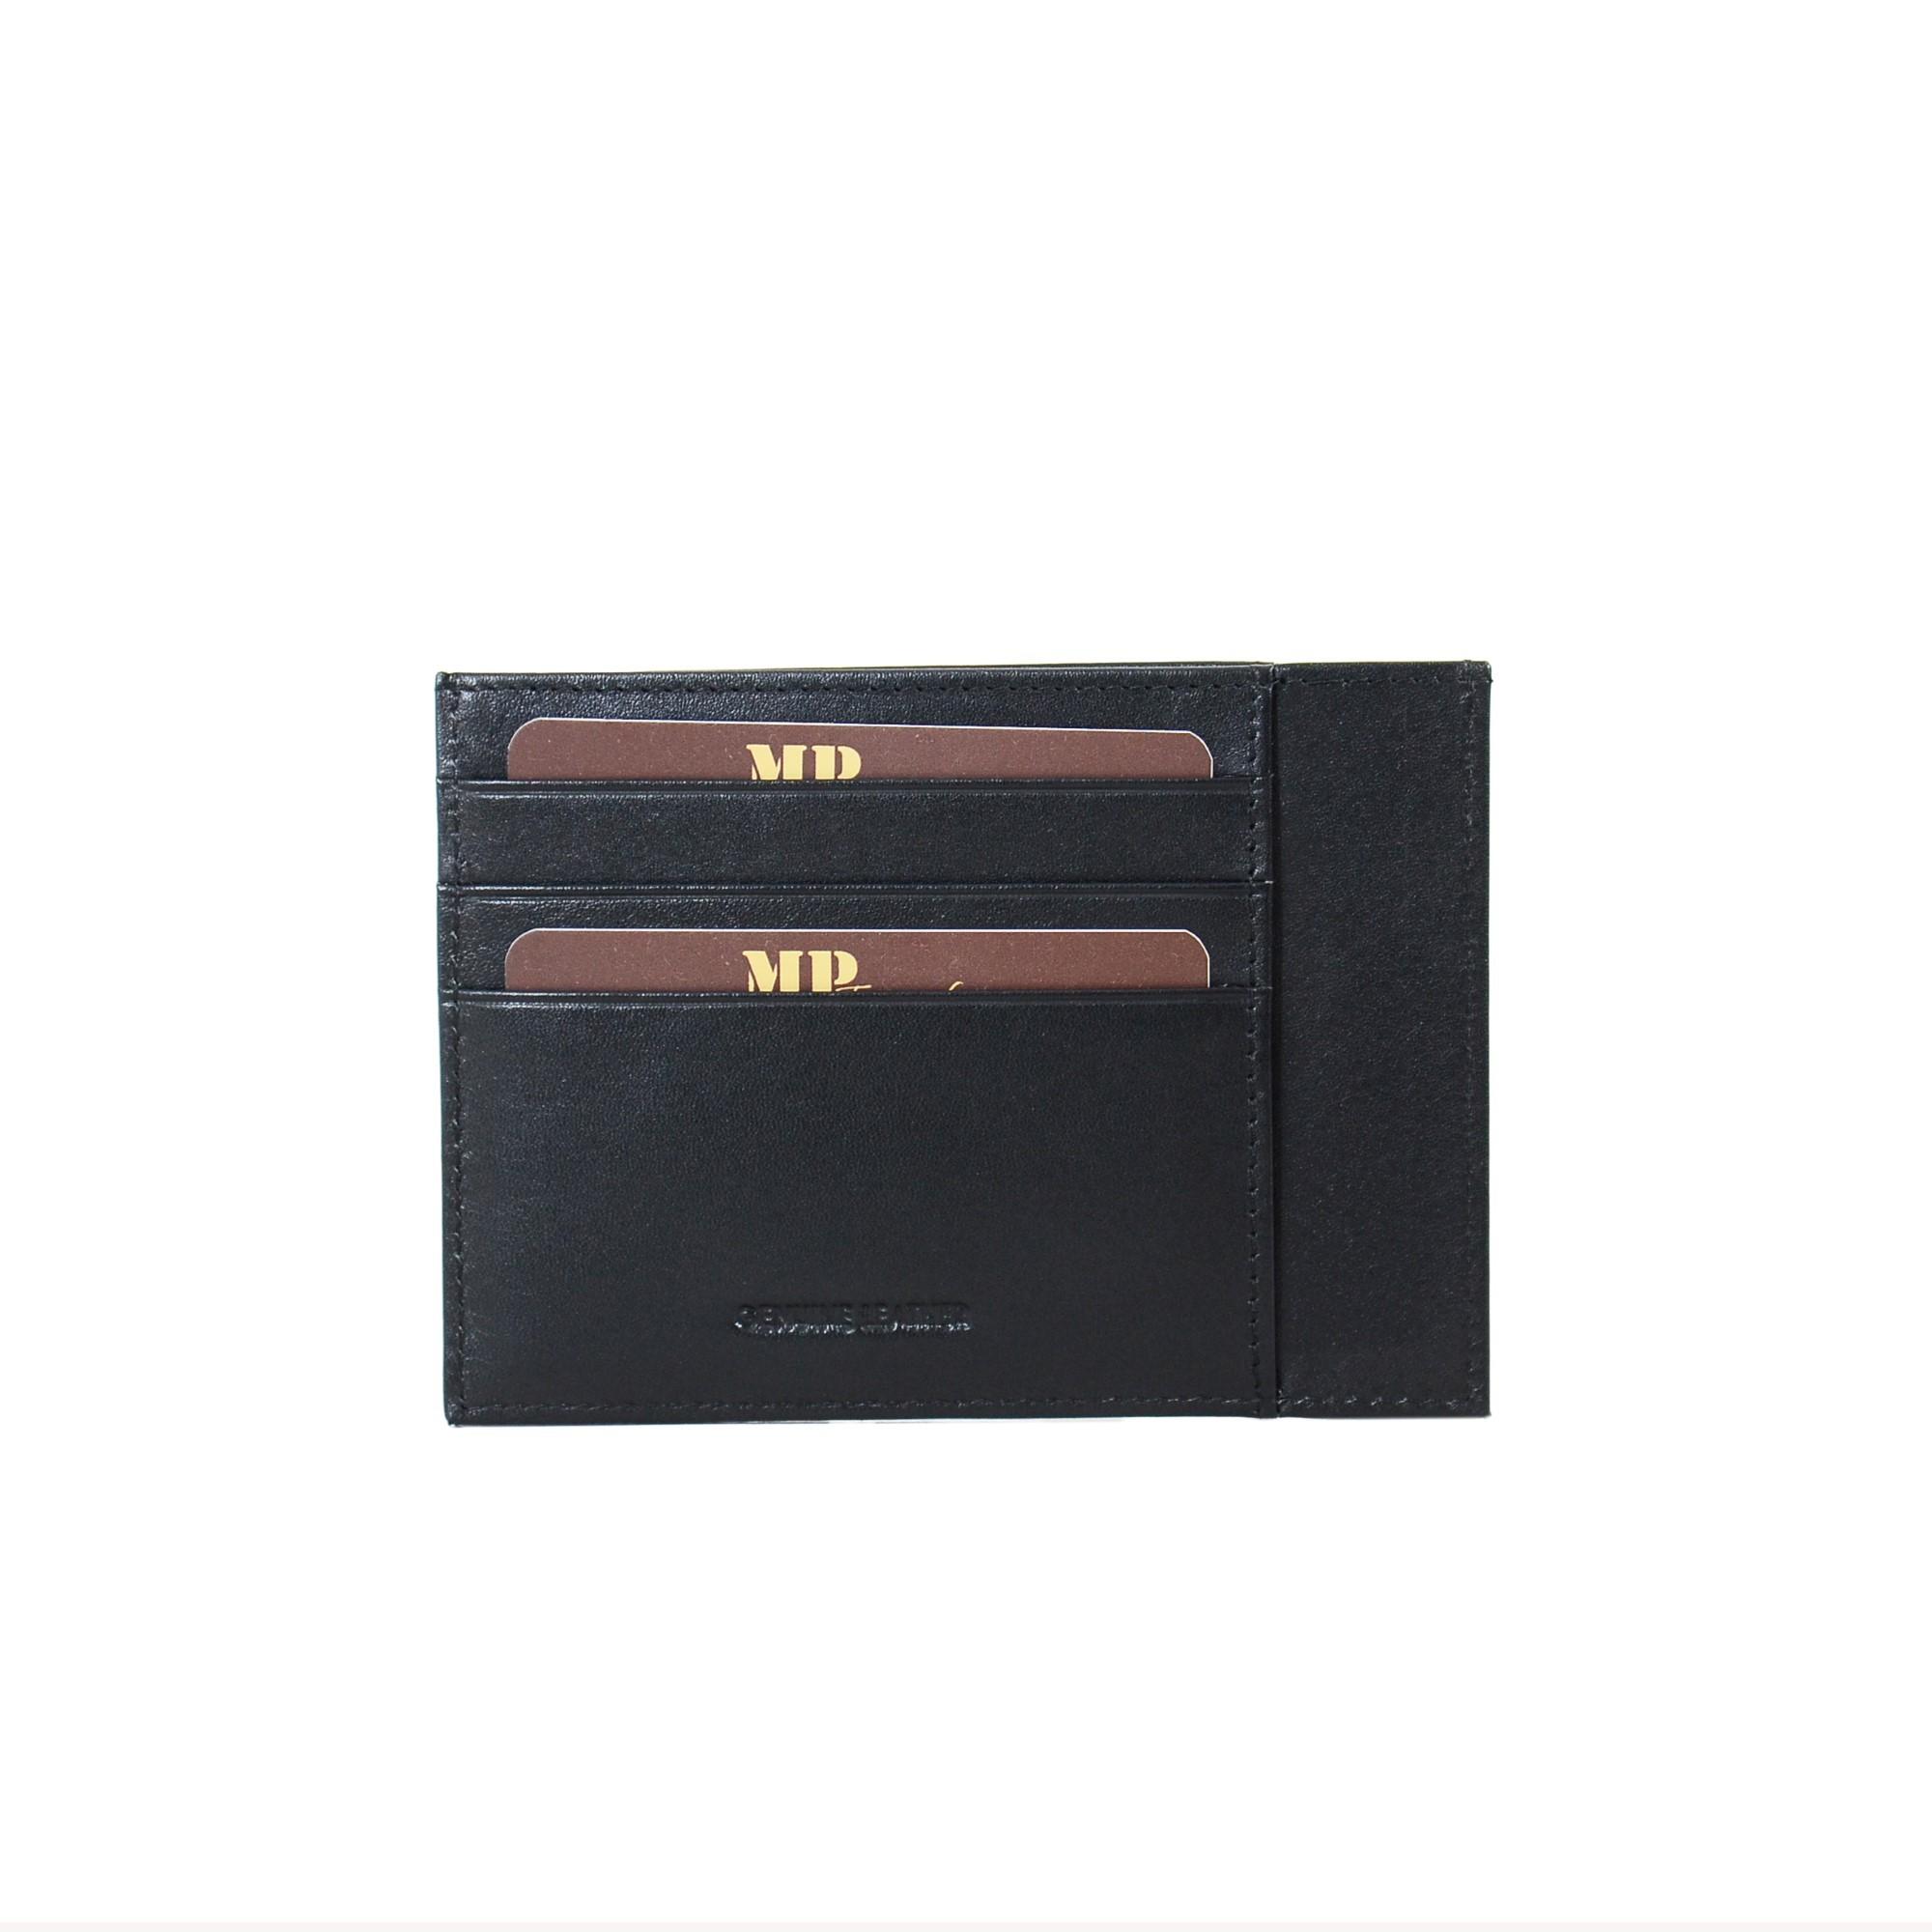 B123296 Preto - Футляр для карт и документов MP